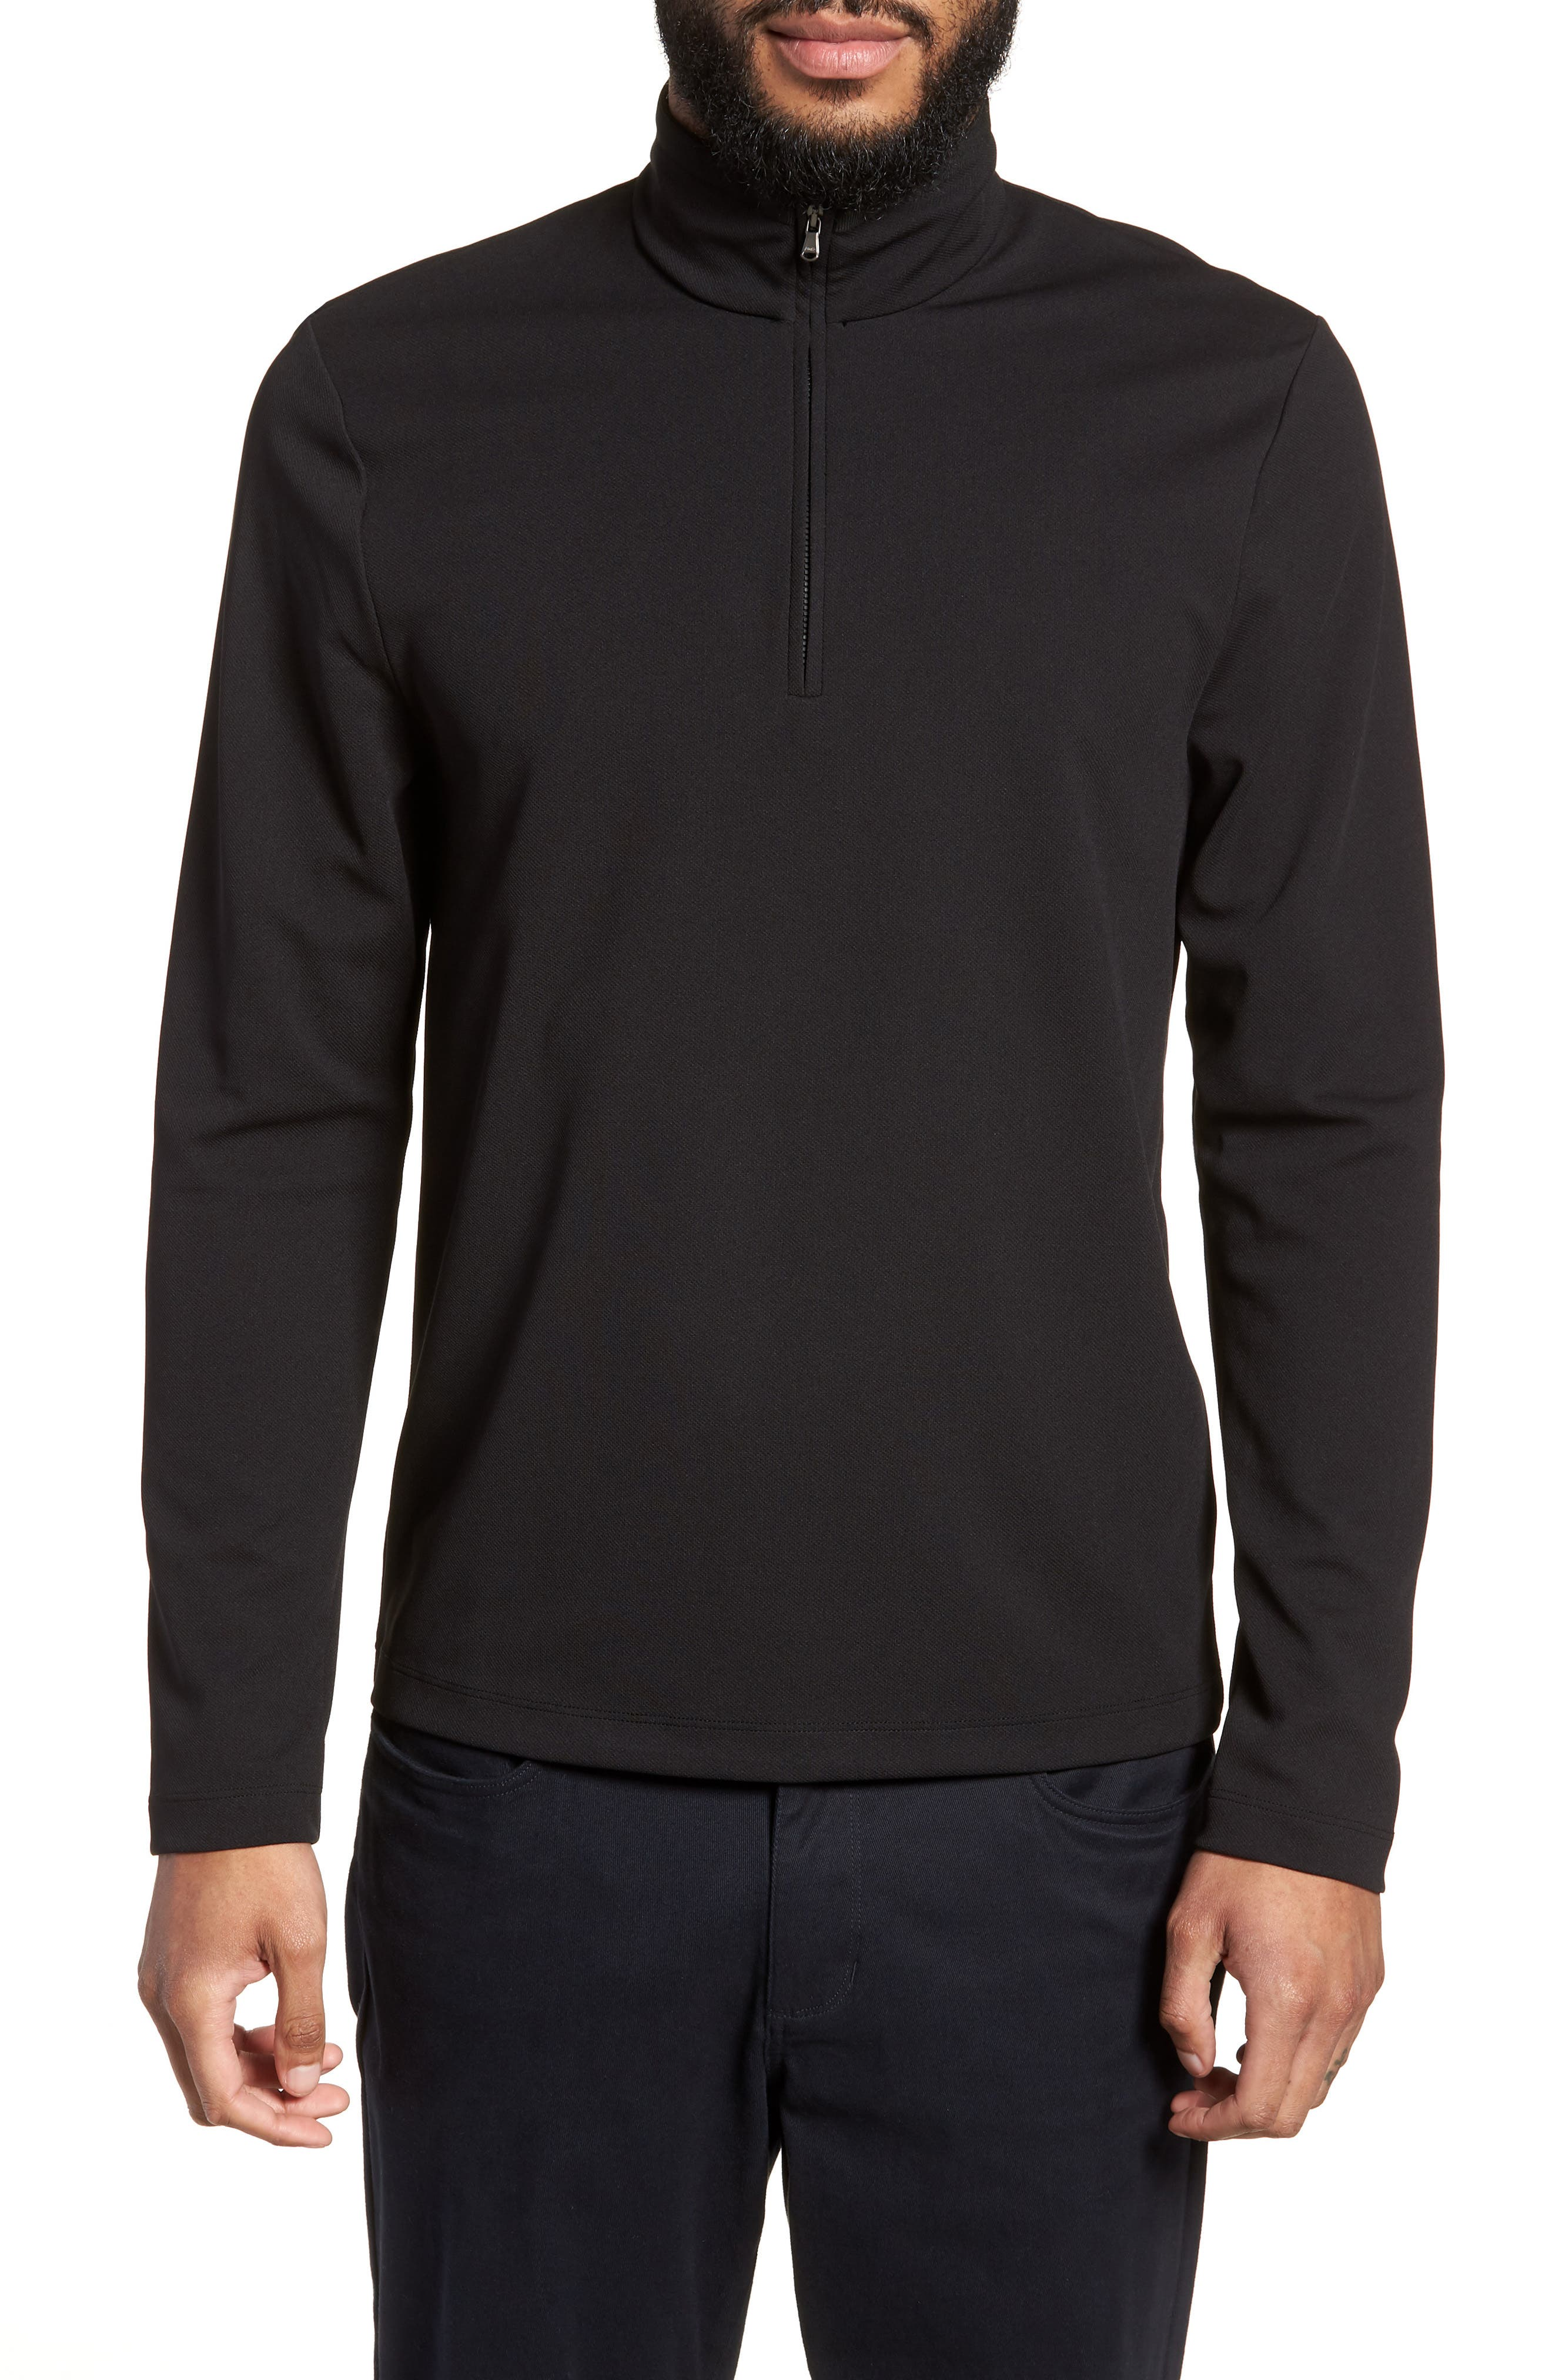 Performance Quarter Zip Pullover,                         Main,                         color, Black/ Black